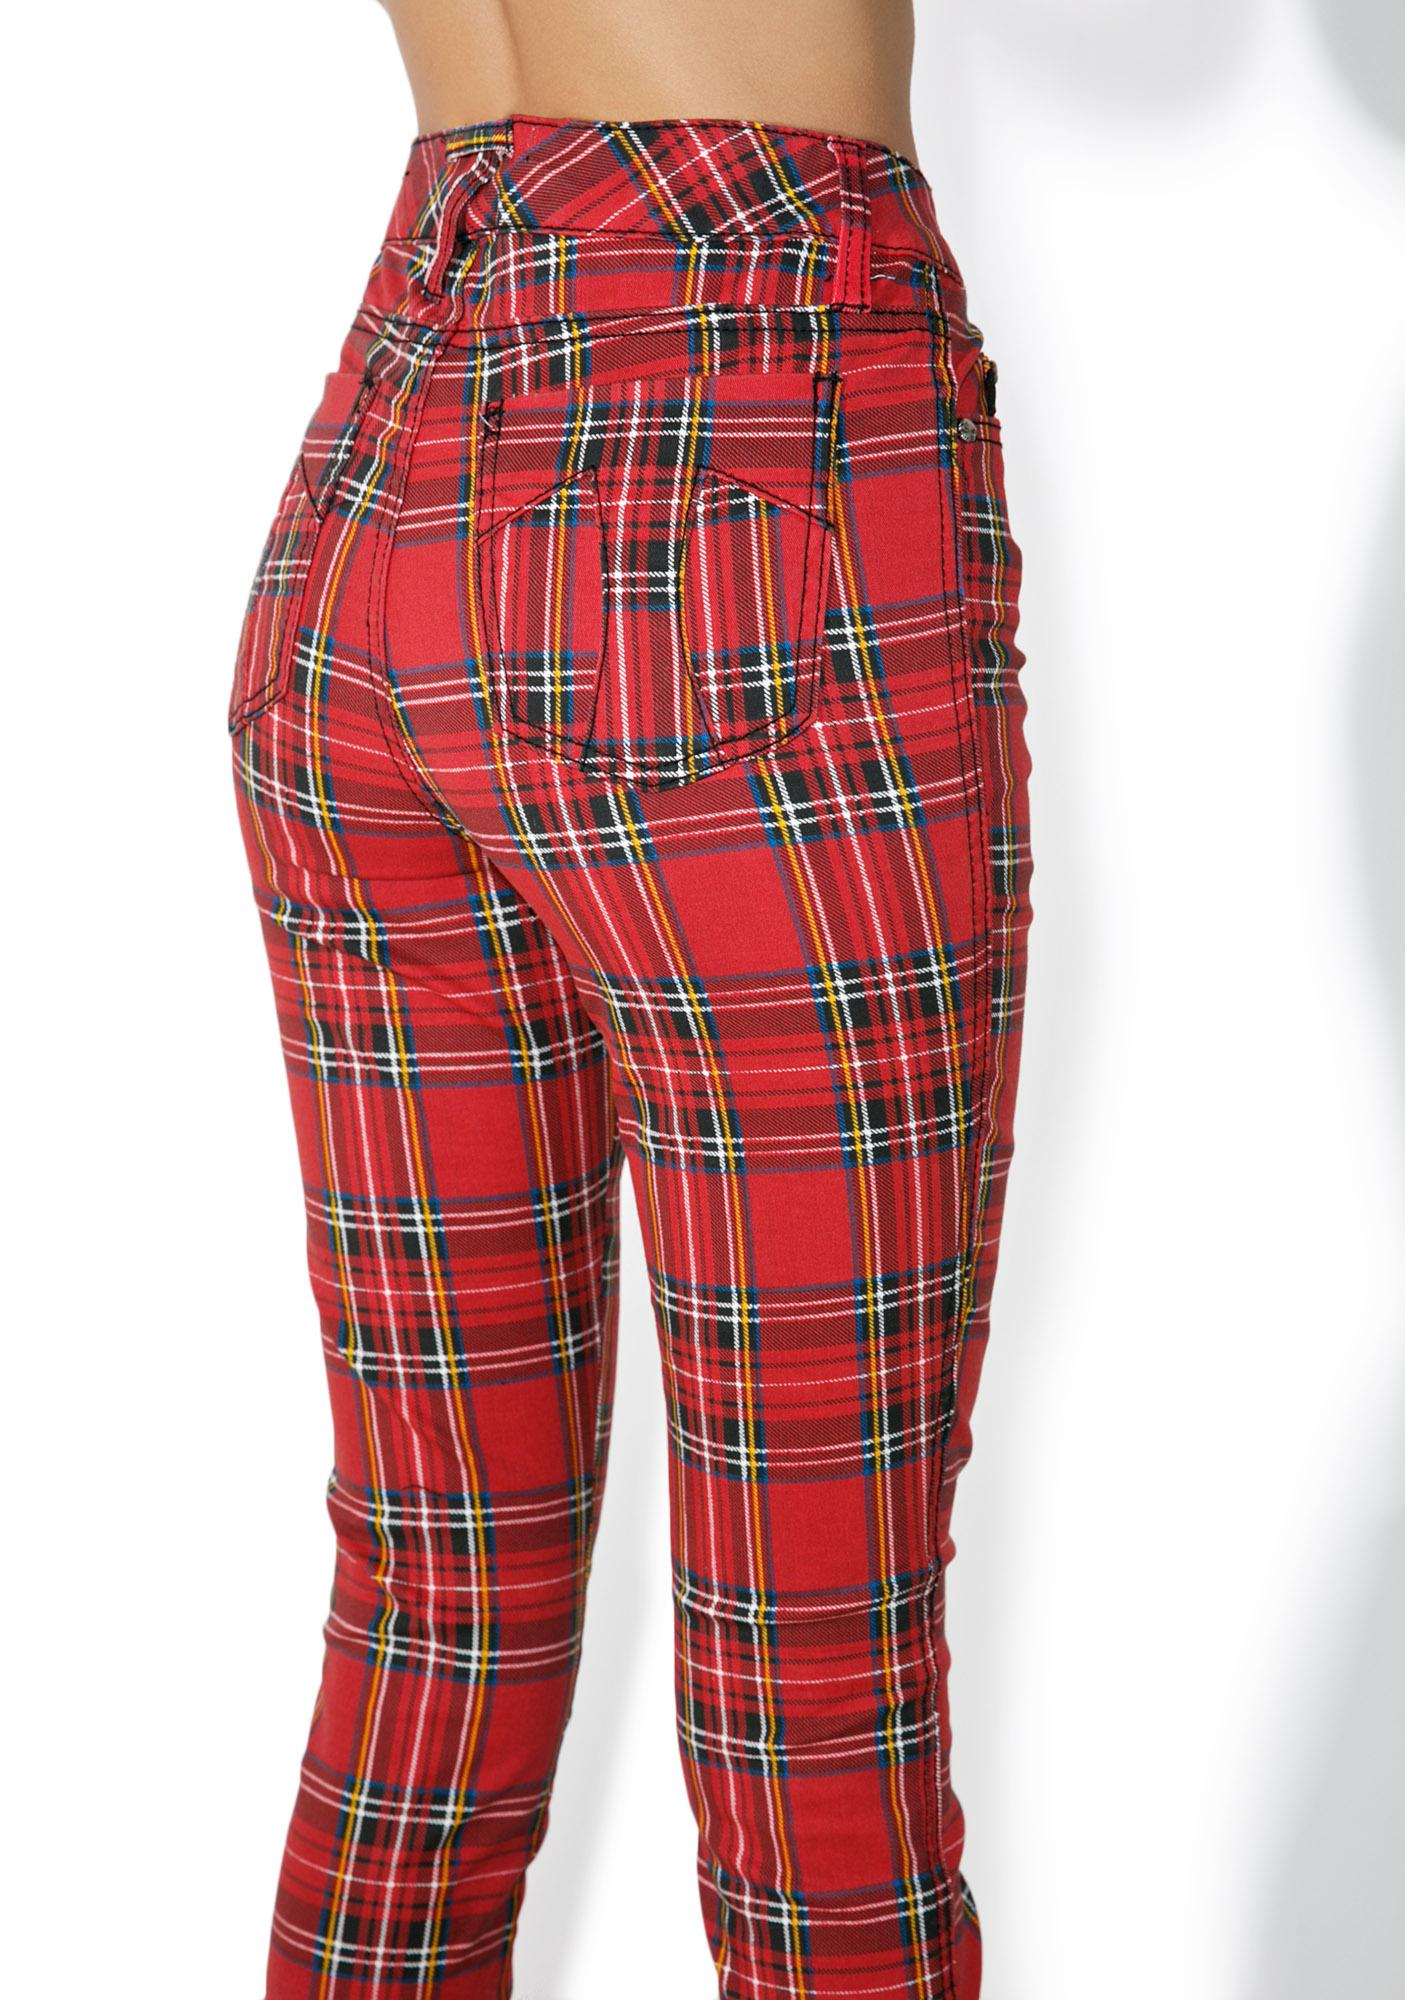 Tripp NYC High Waisted Plaid Pants | Dolls Kill